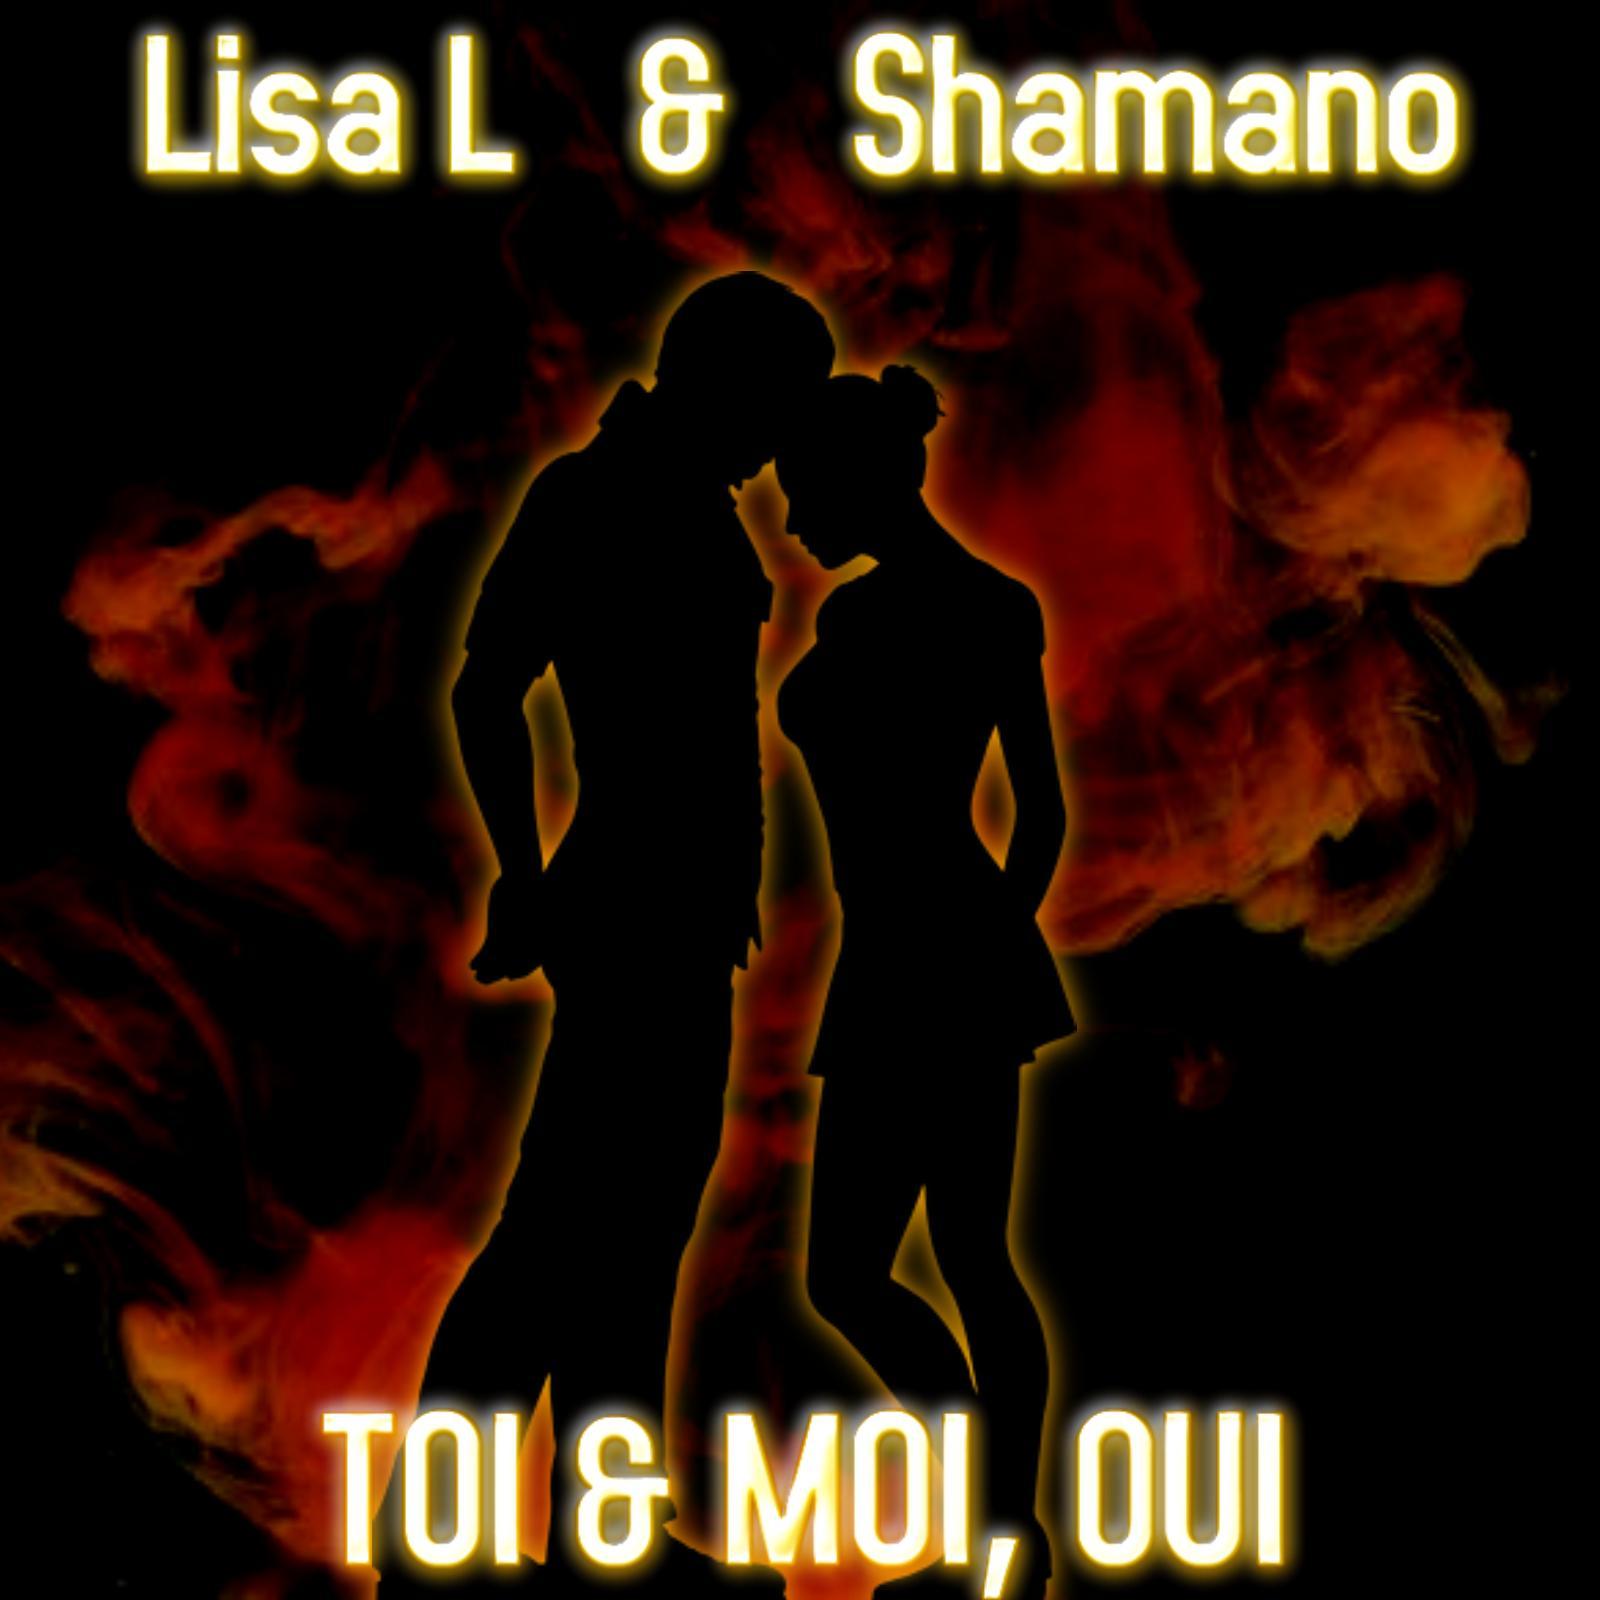 Lisa L & Shamano - Toi & moi, oui